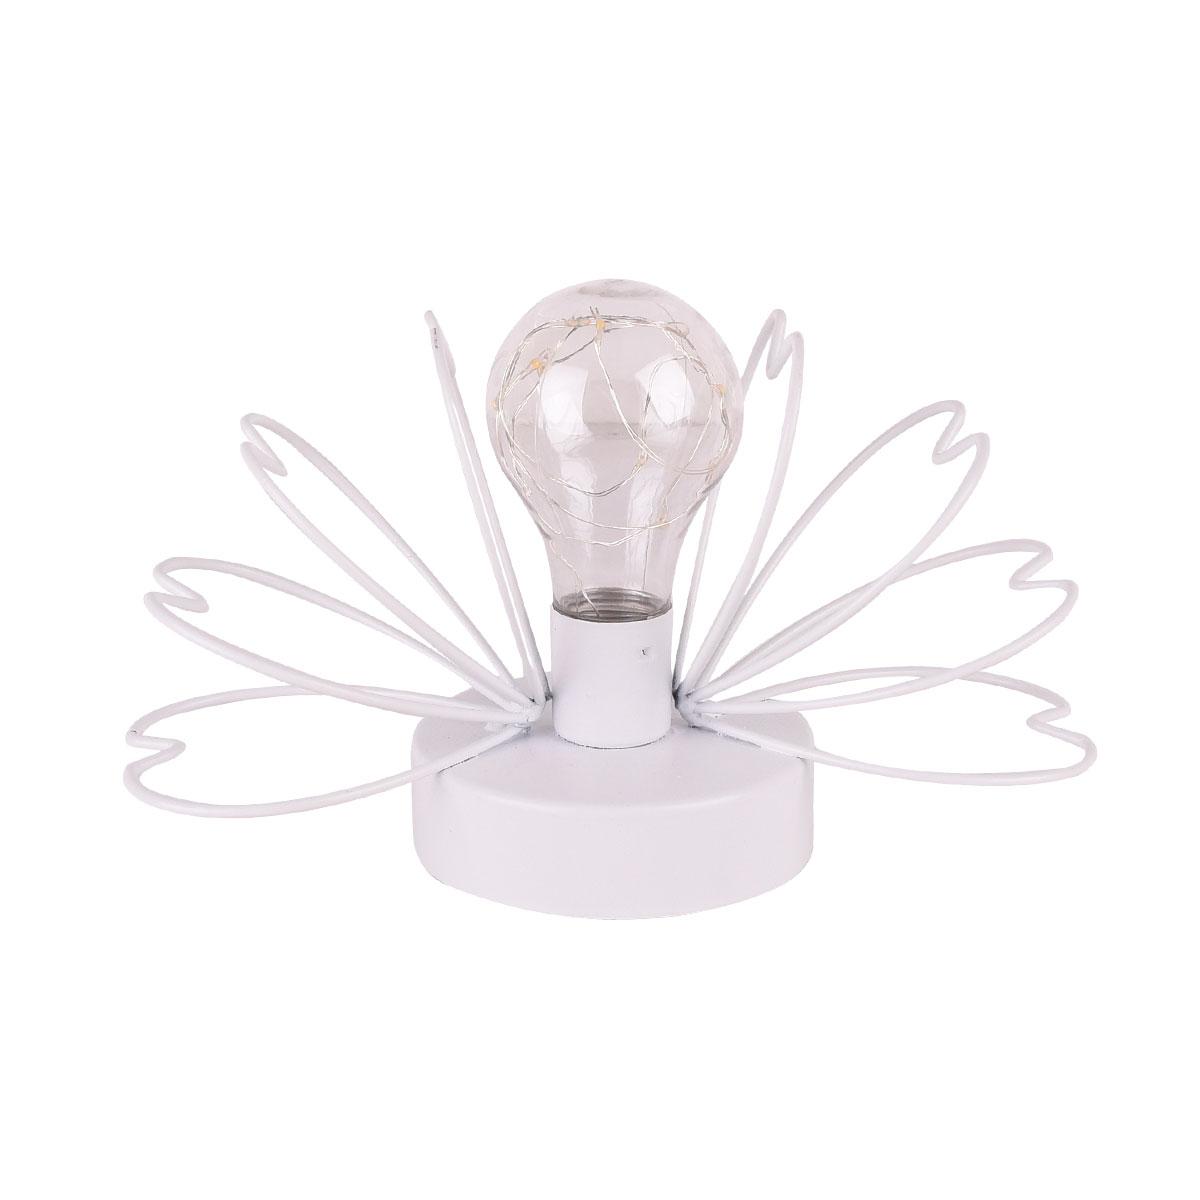 مصباح مضيئ يعمل بالبطاريات - ضوء اصفر MM-409